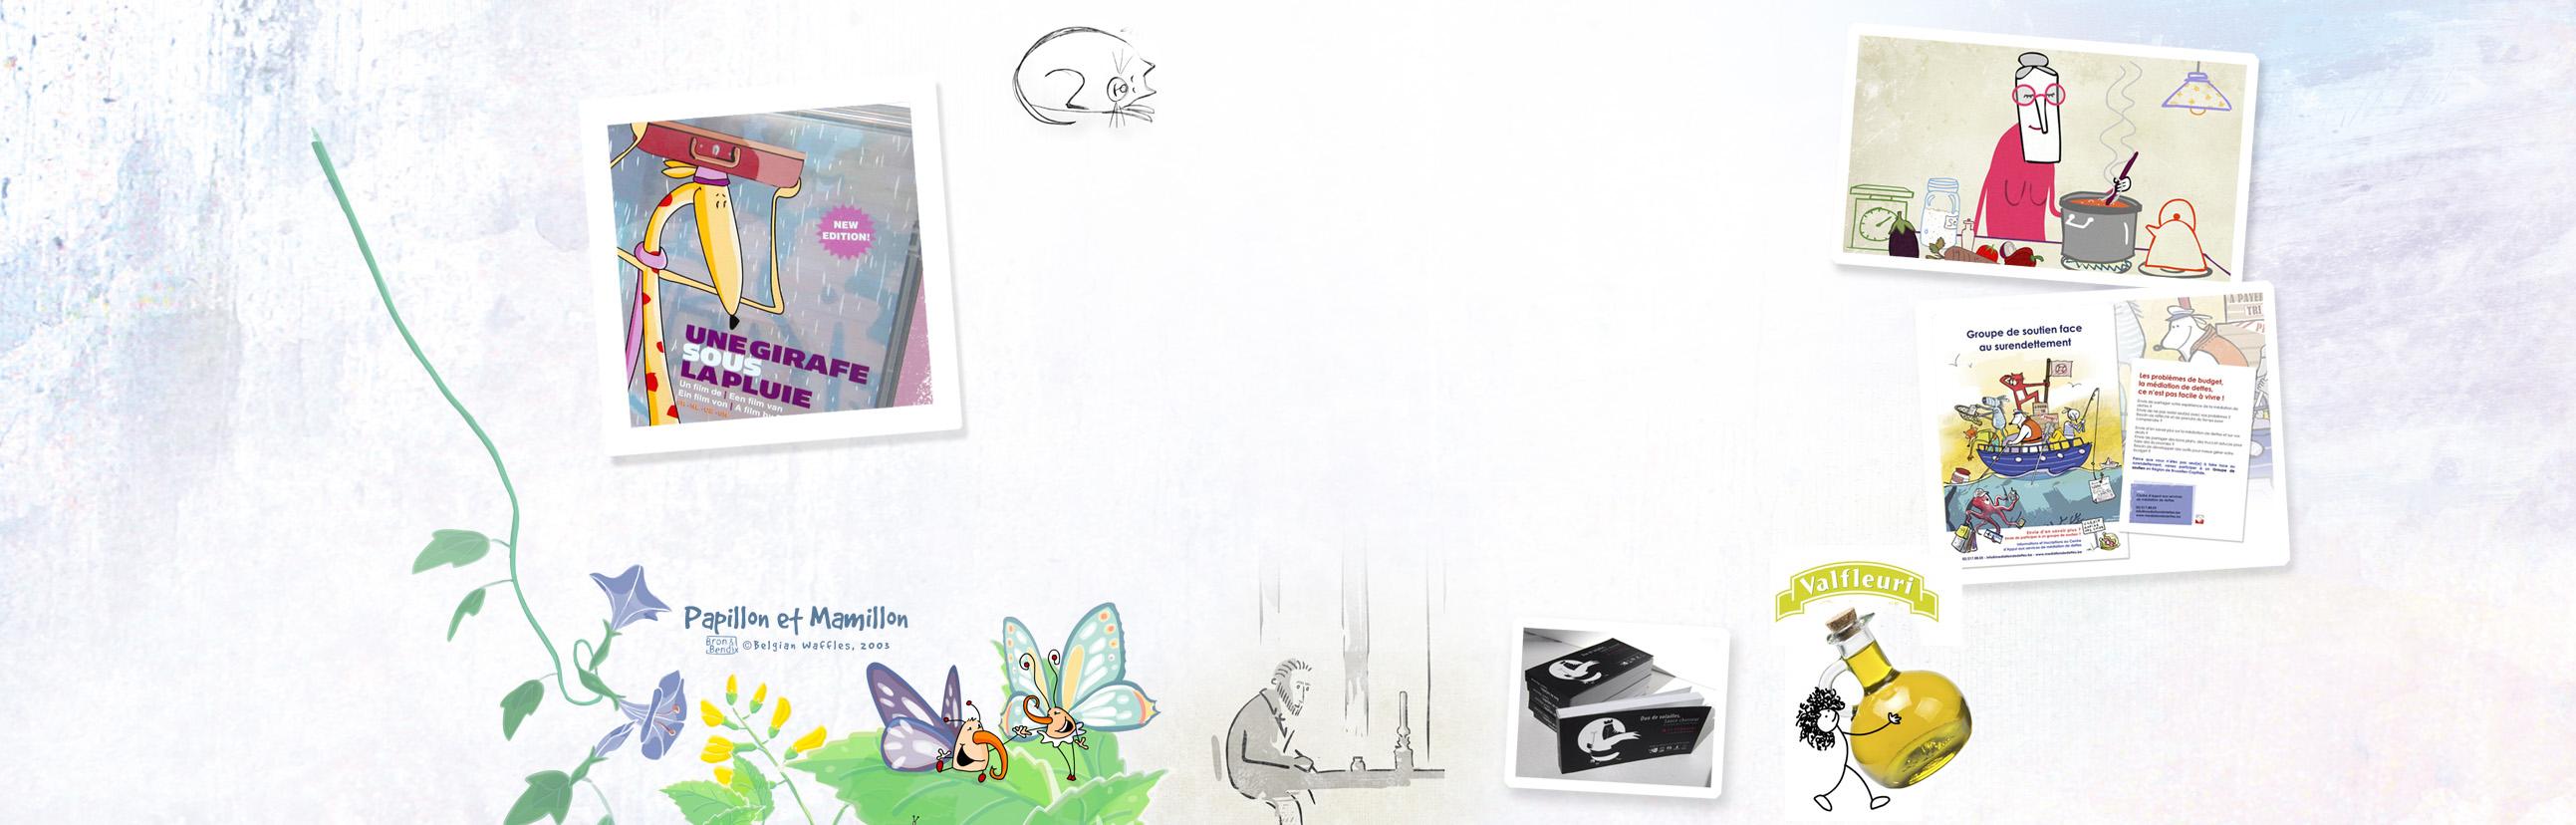 video_animation_illustration